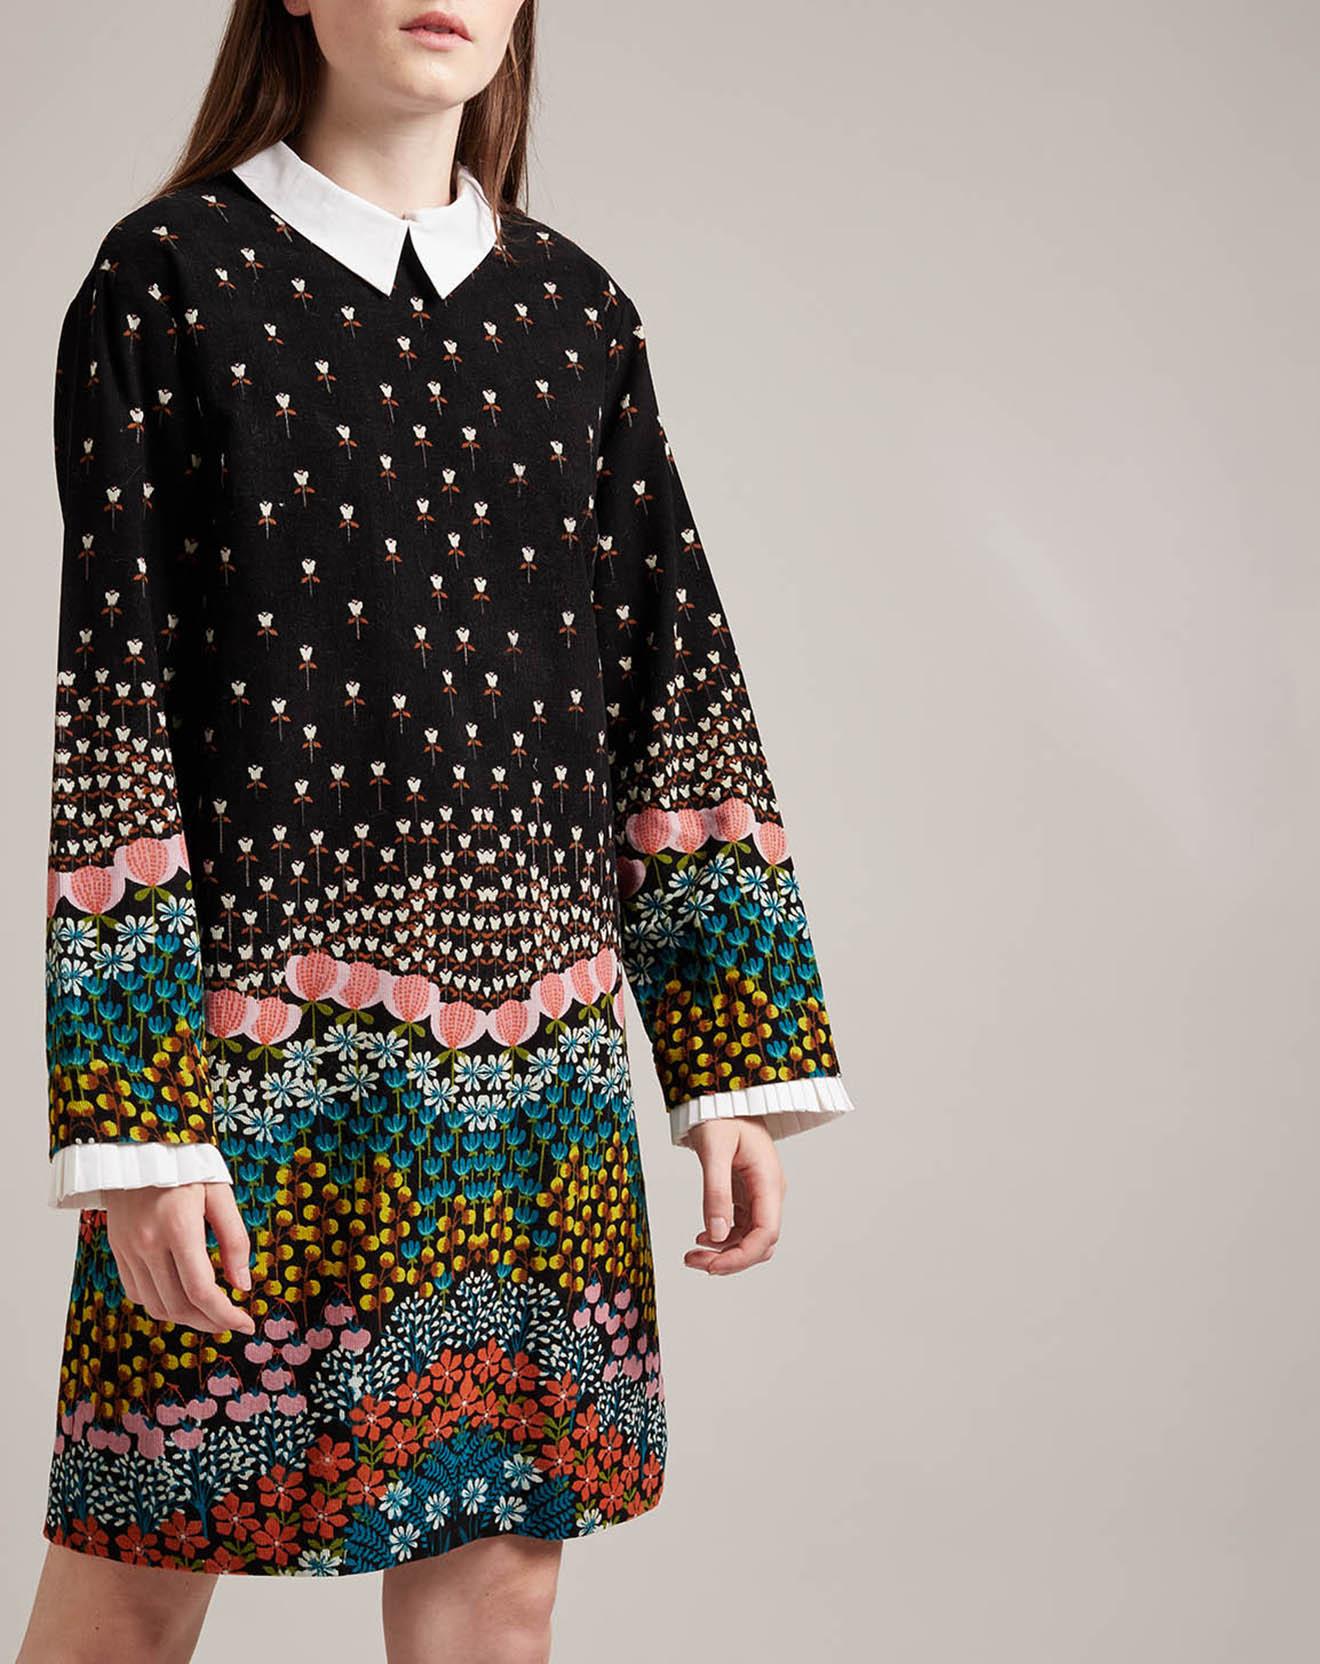 Robe courte Palmares col claudine imprimé fantaisie noire - Derhy - Modalova